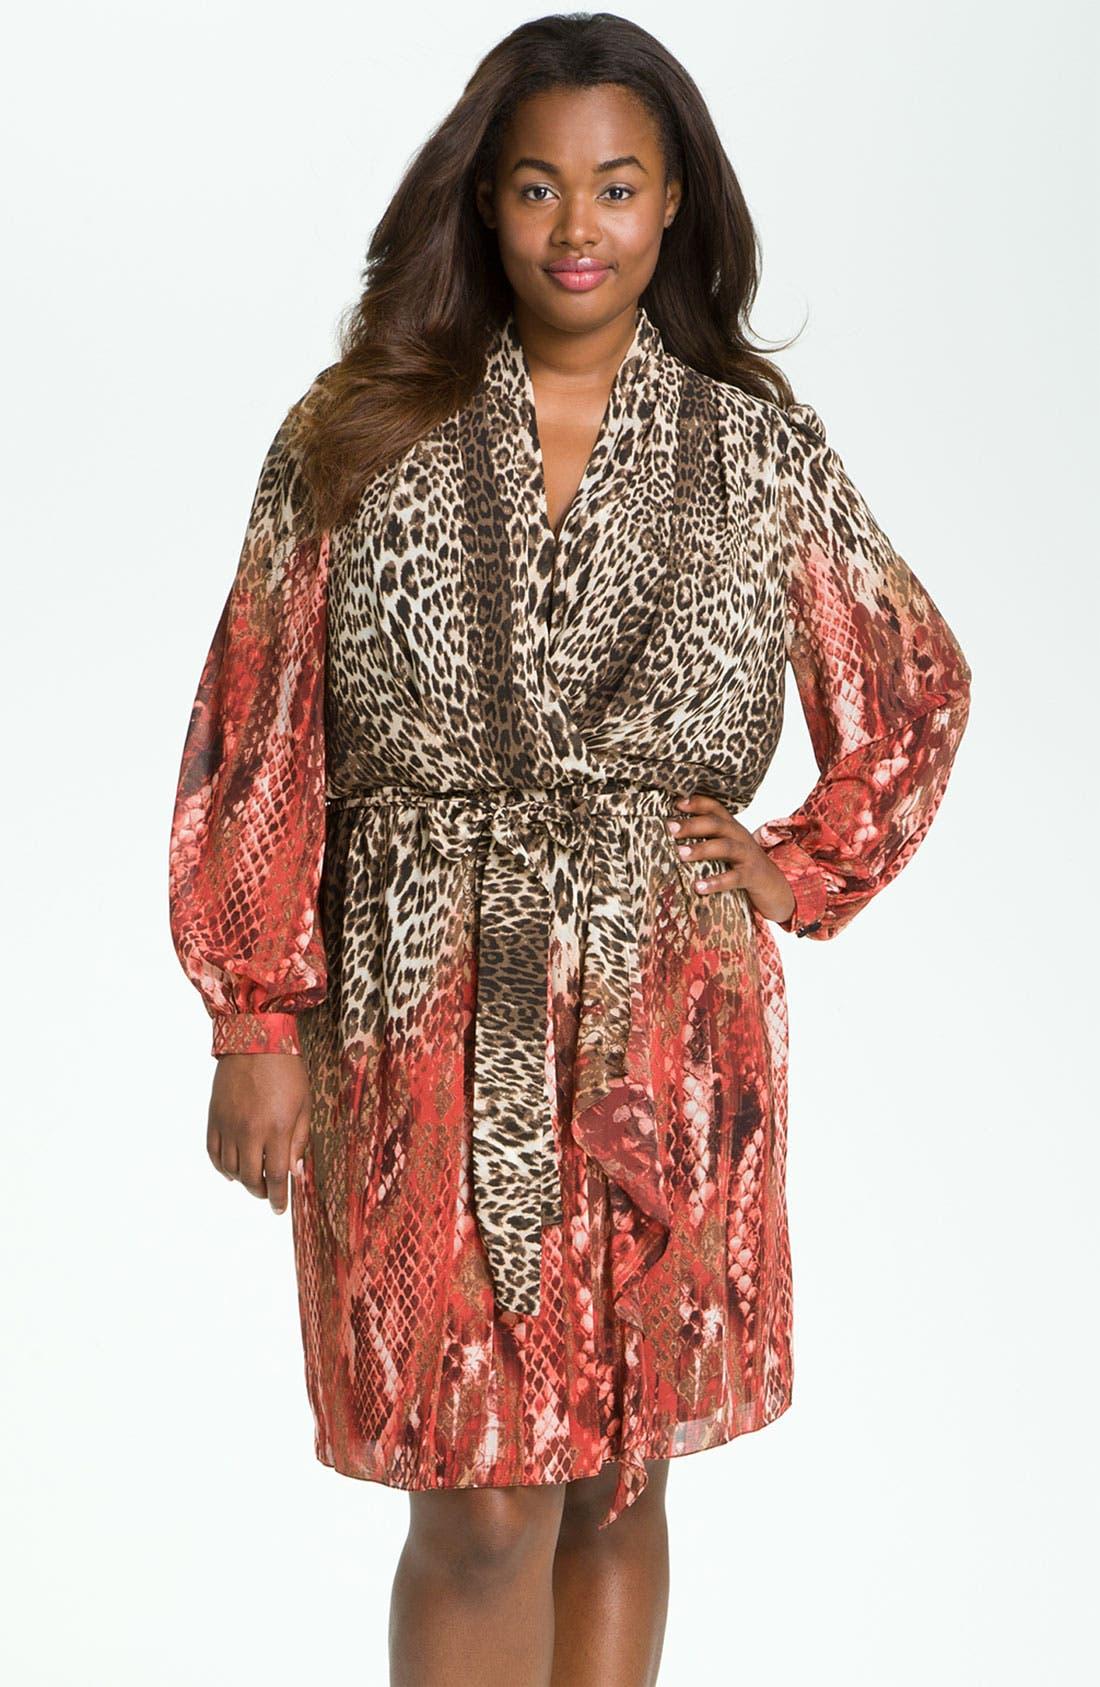 Alternate Image 1 Selected - Donna Ricco Animal Print Surplice Chiffon Dress (Plus Size)